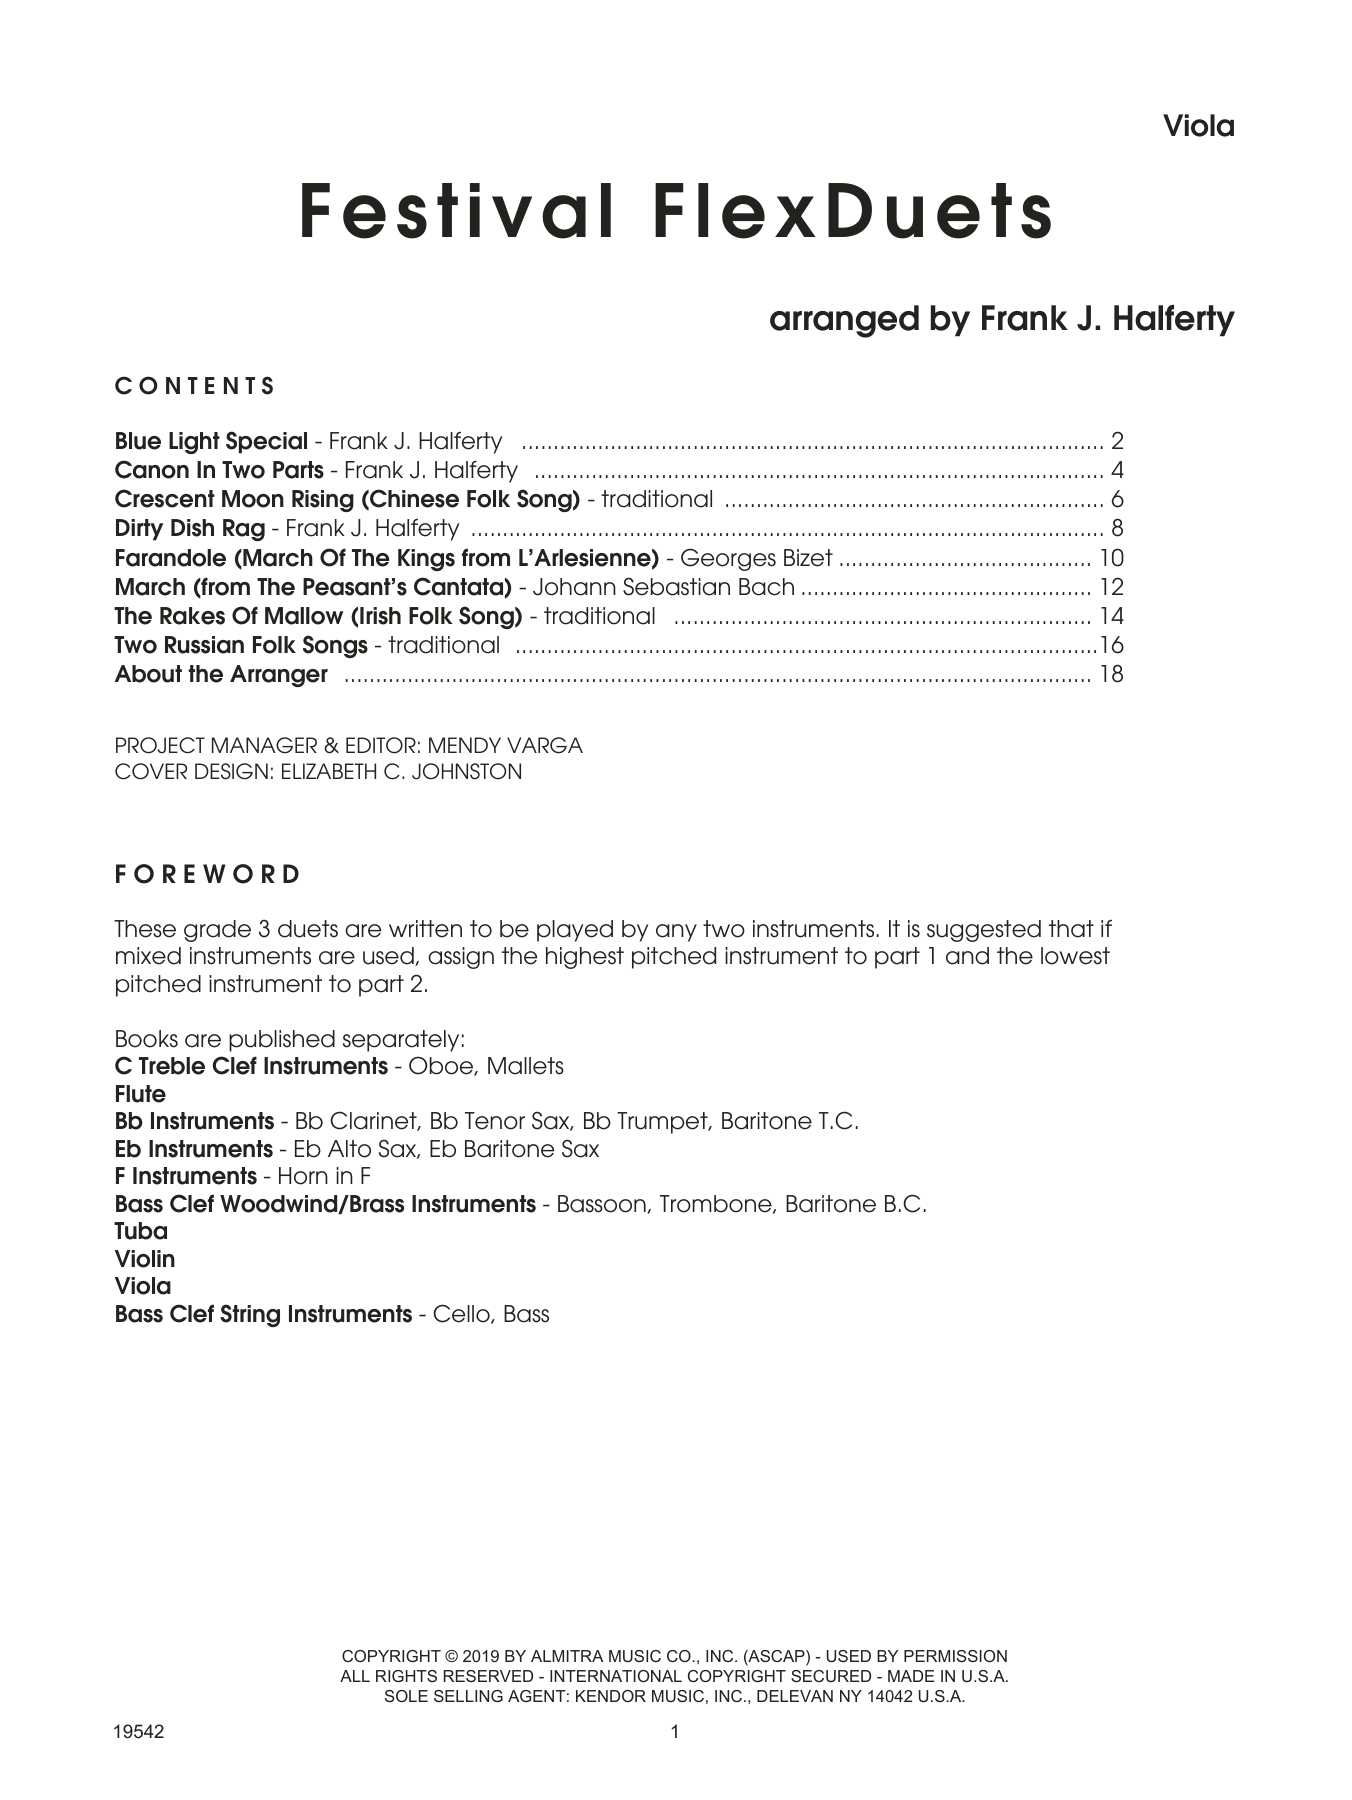 Frank J. Halferty Festival FlexDuets - Viola sheet music notes and chords. Download Printable PDF.